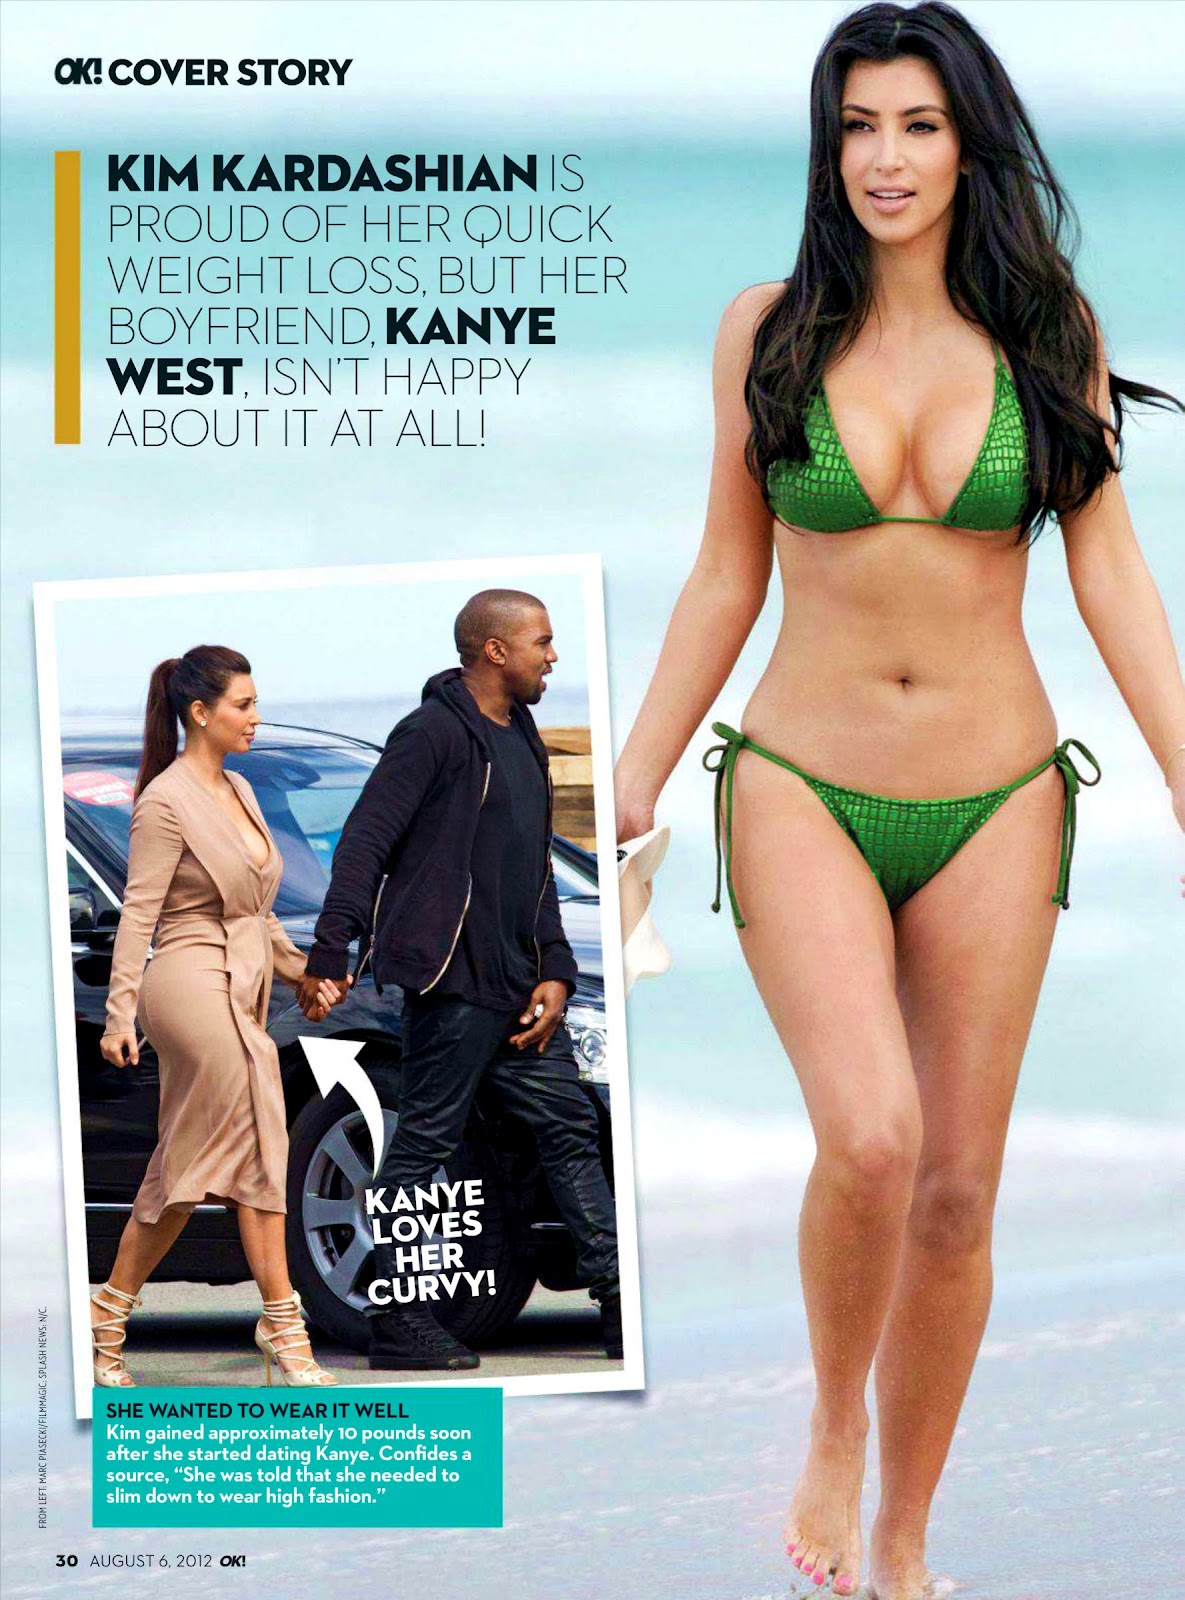 http://3.bp.blogspot.com/-CjtOlU8fV4Y/UBhHWMiwBQI/AAAAAAAATD0/SCMuIqTFFWc/s1600/Kim+Kardashian+in+Green+and+Pink+Bikinis+-+OK%21+Magazine+Cover,+August+2012+2.jpg